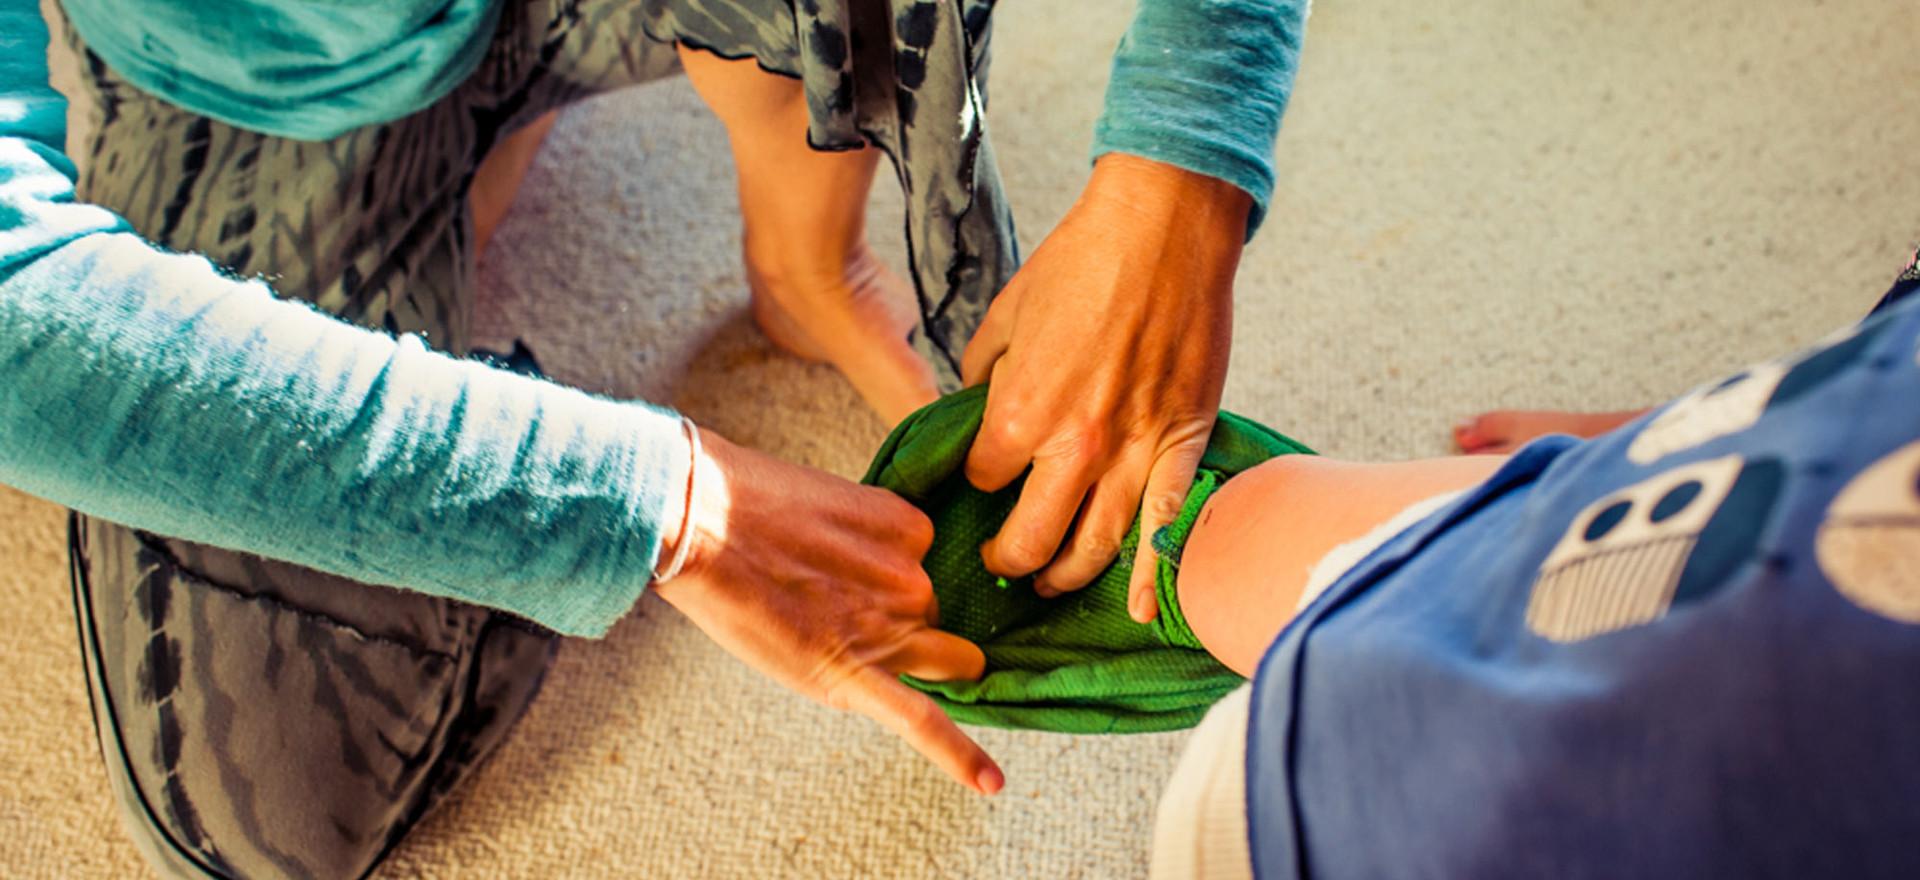 mum-helps-toddler-with-pants-josie-gritt